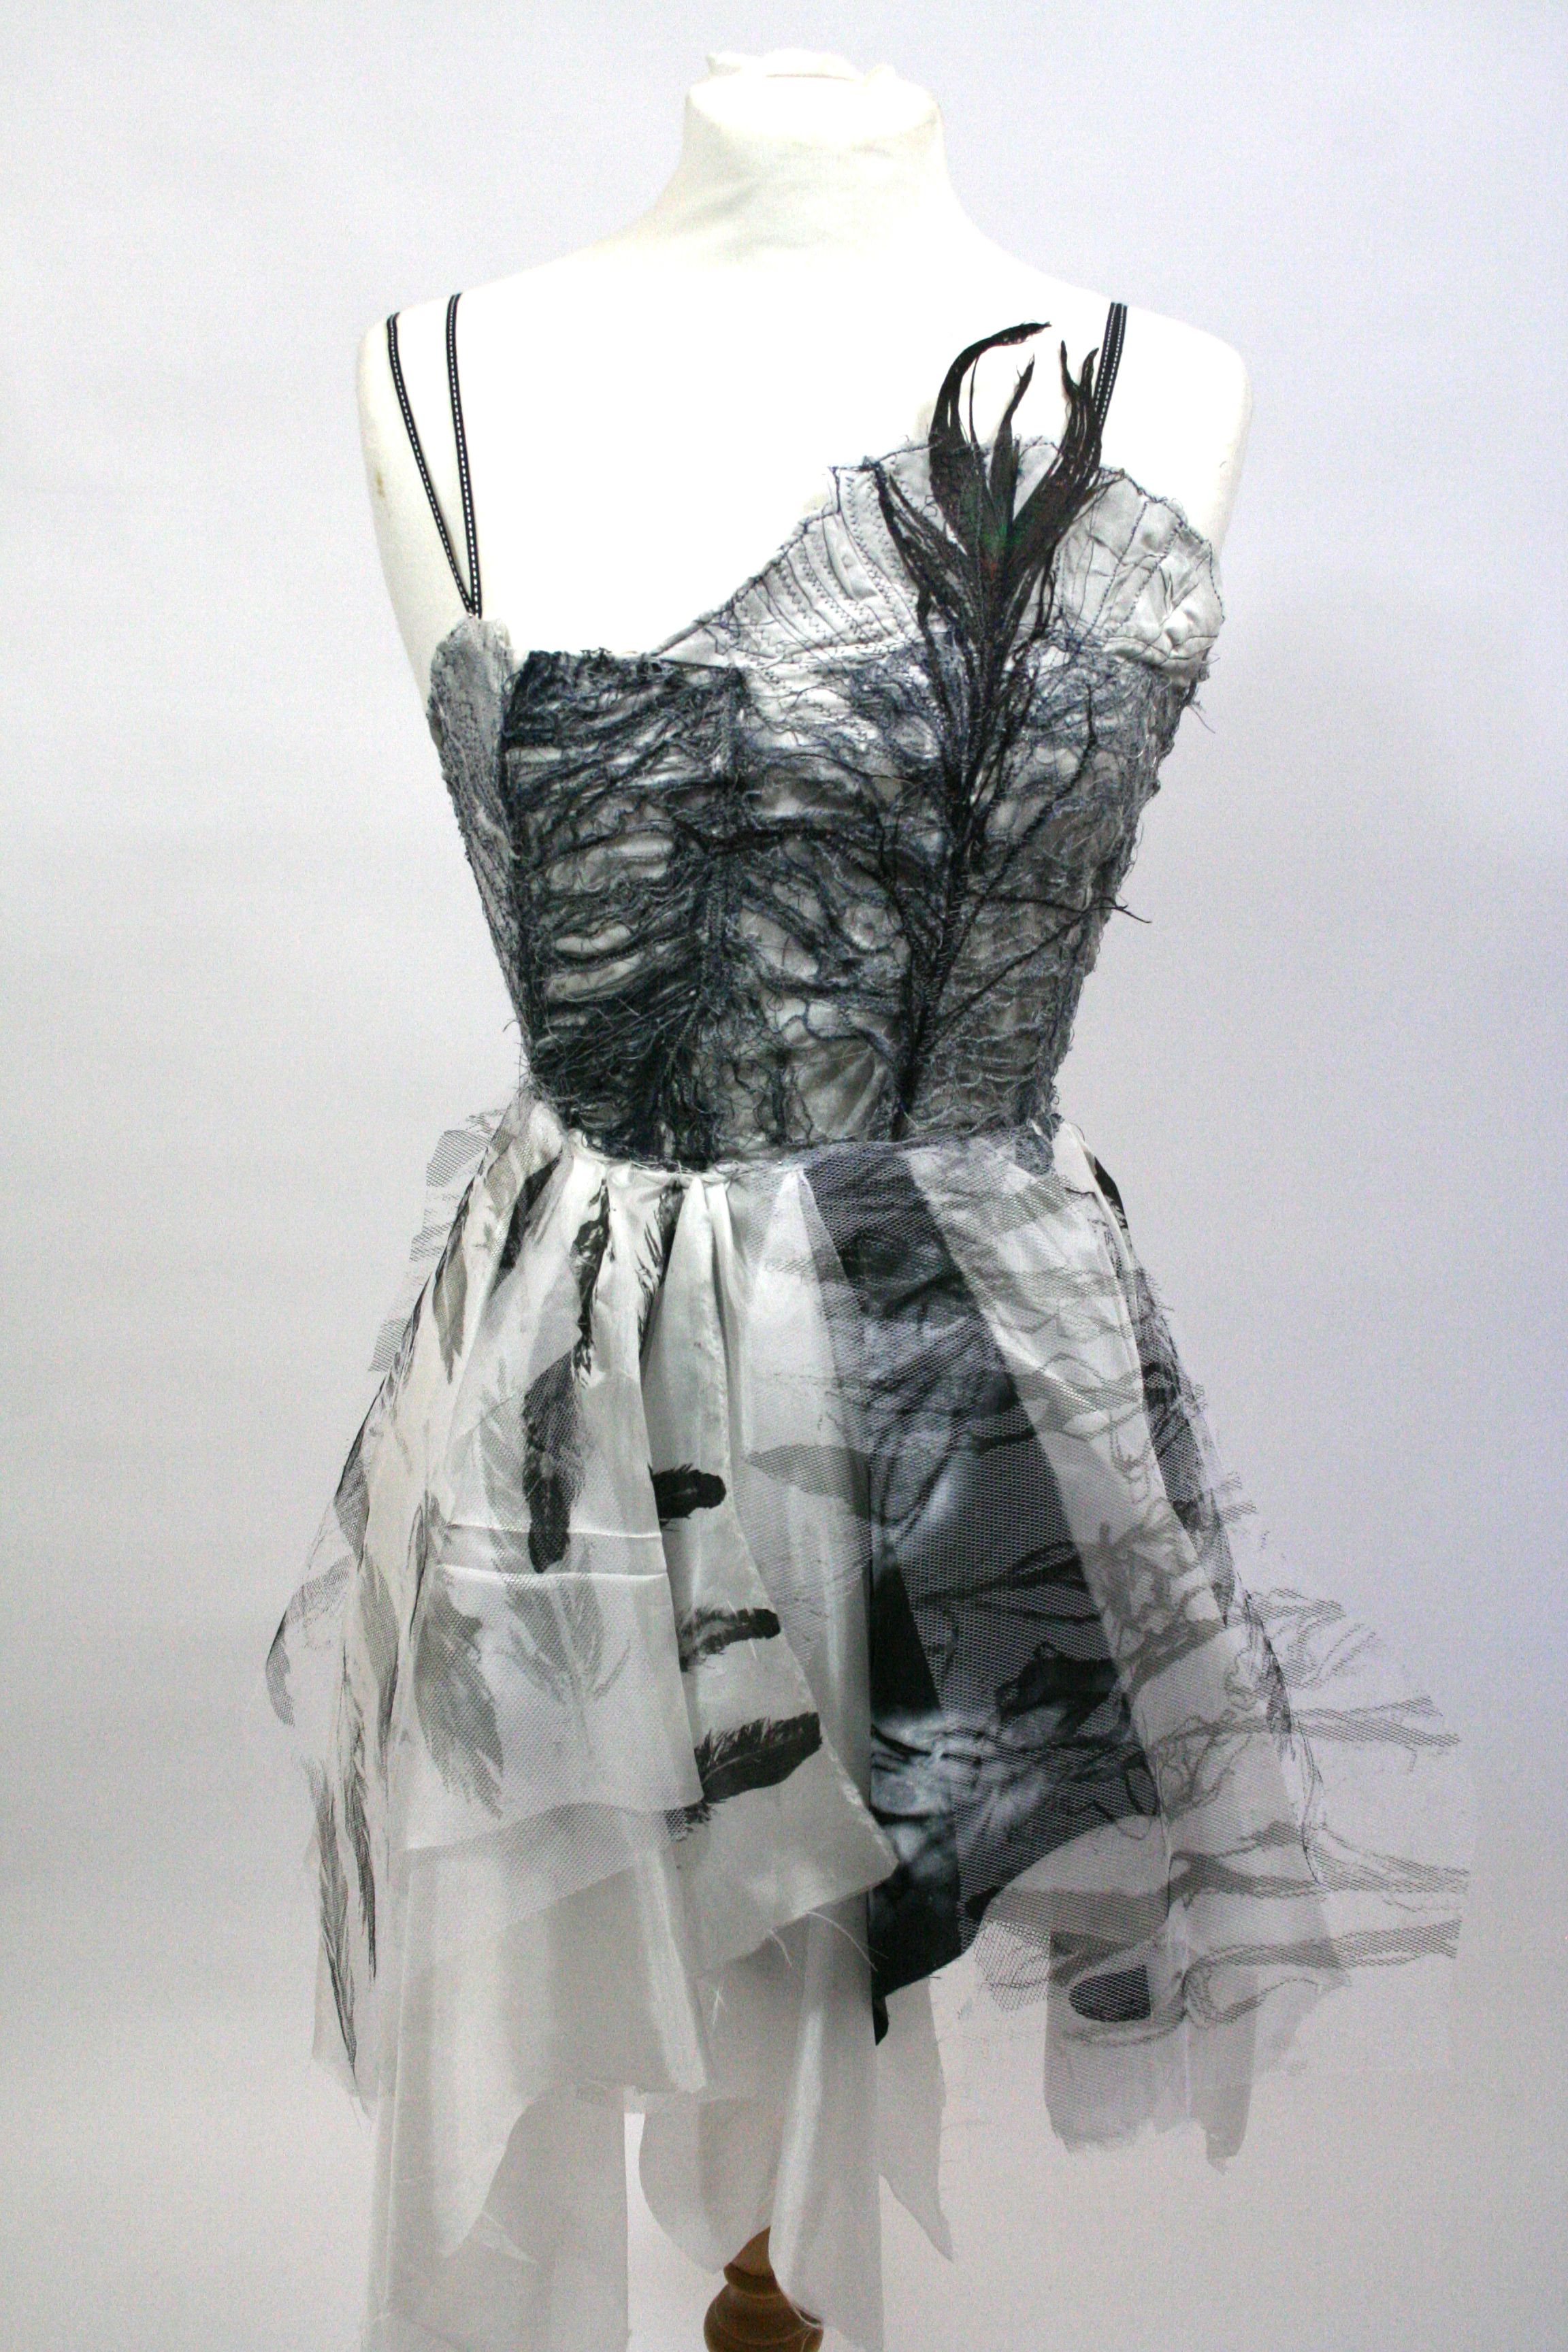 HIGHER DESIGN OUTCOME TEXTILE DESIGN MORRISONS ACADEMY   Fabric ... 5a04809c242